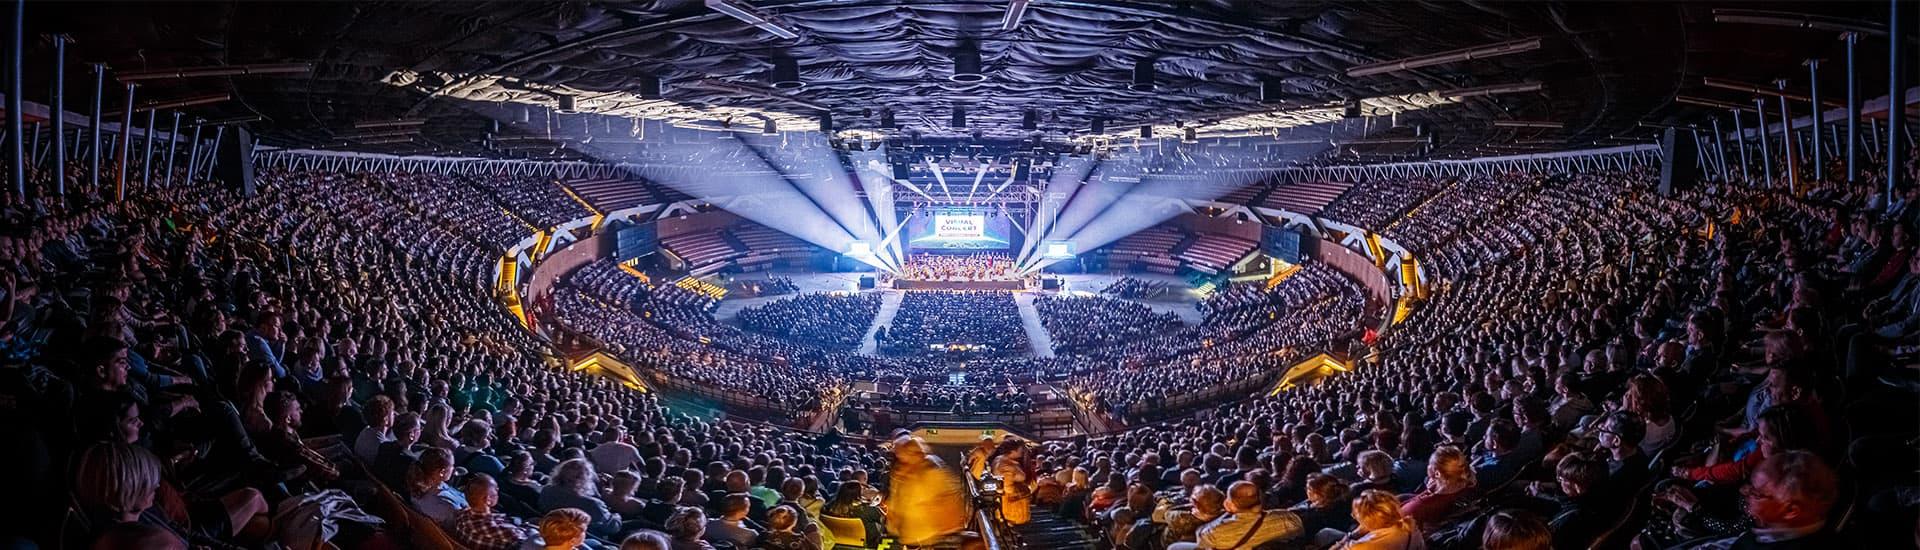 visual-concert-spodek-katowice-min